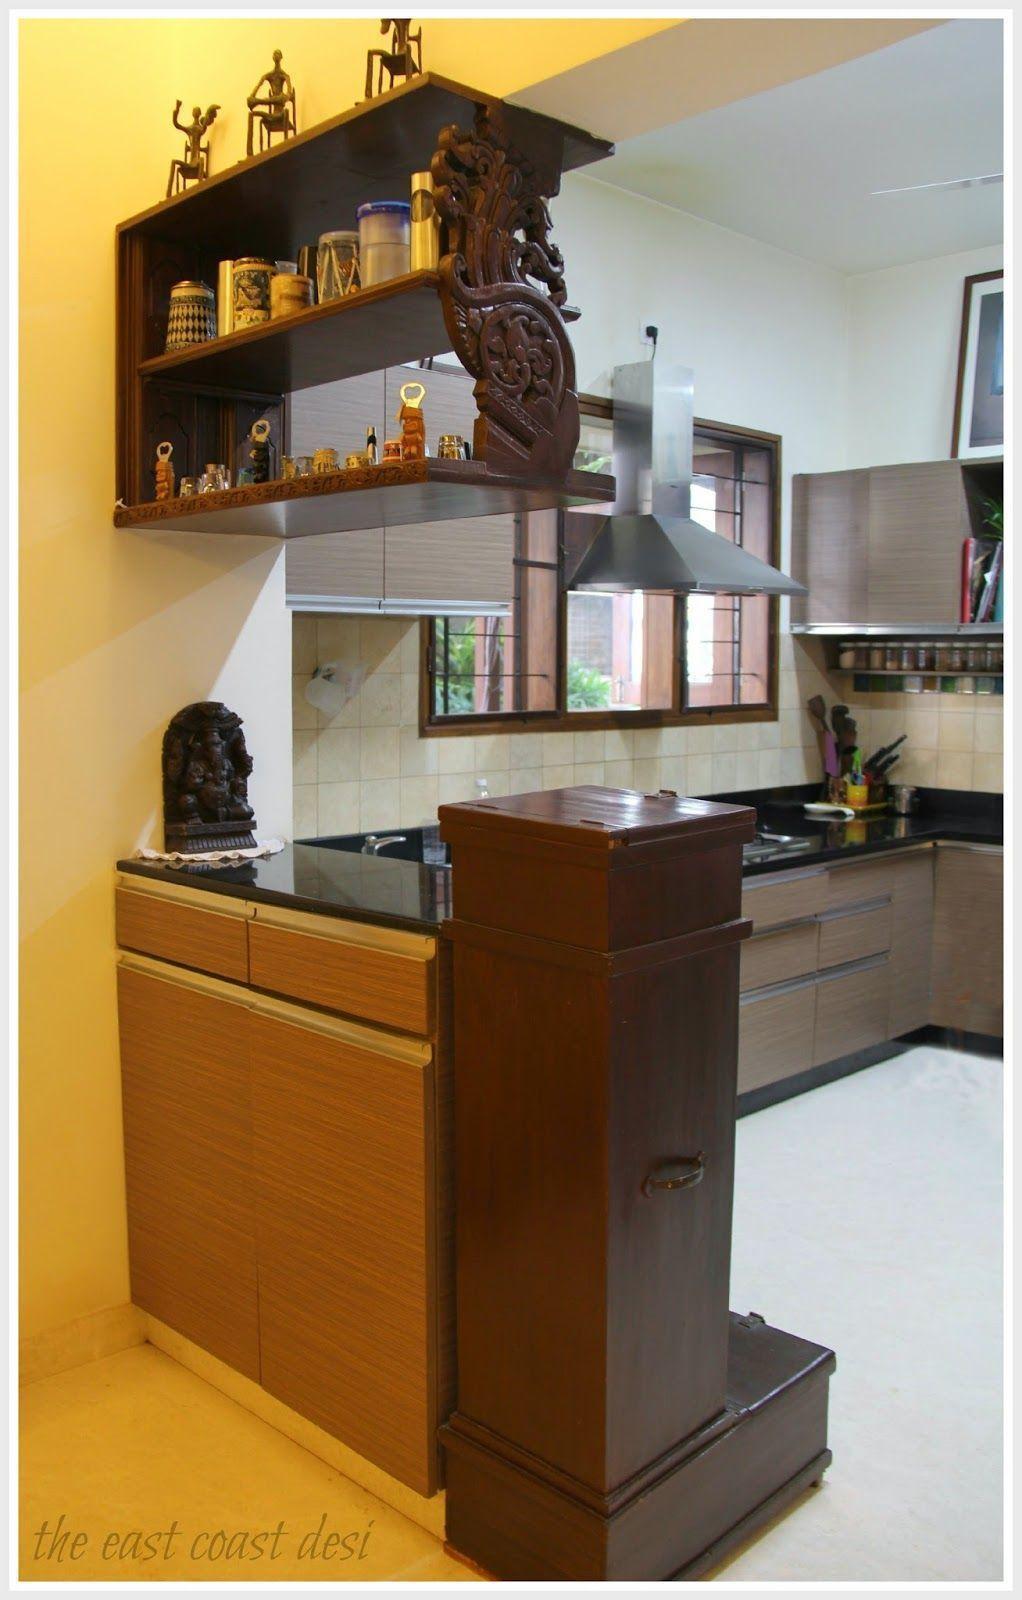 12 Classy 80s Kitchen Remodel Cupboards Ideas Interior Kitchen Small Kitchen Design Small Open Kitchen Interior